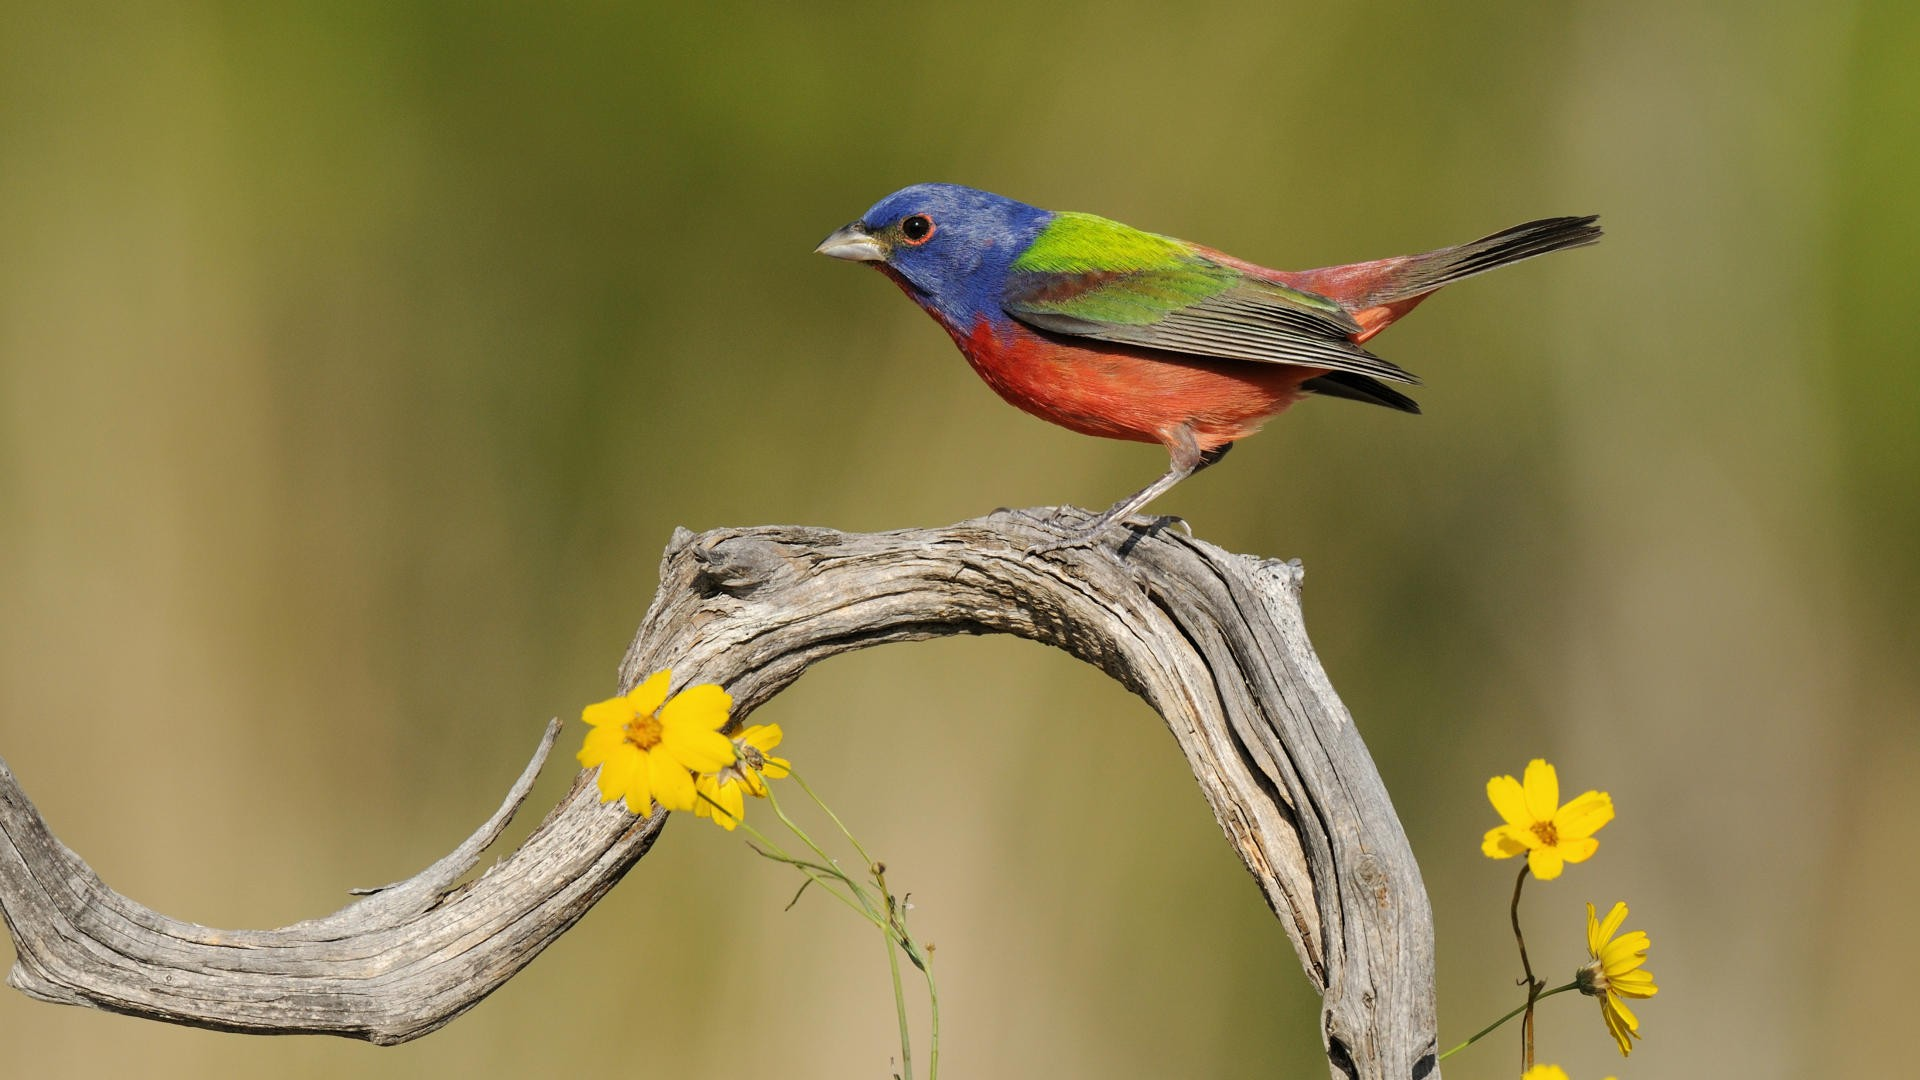 Cute Birds Hd Wallpaper Free Download: Bird HD Wallpaper